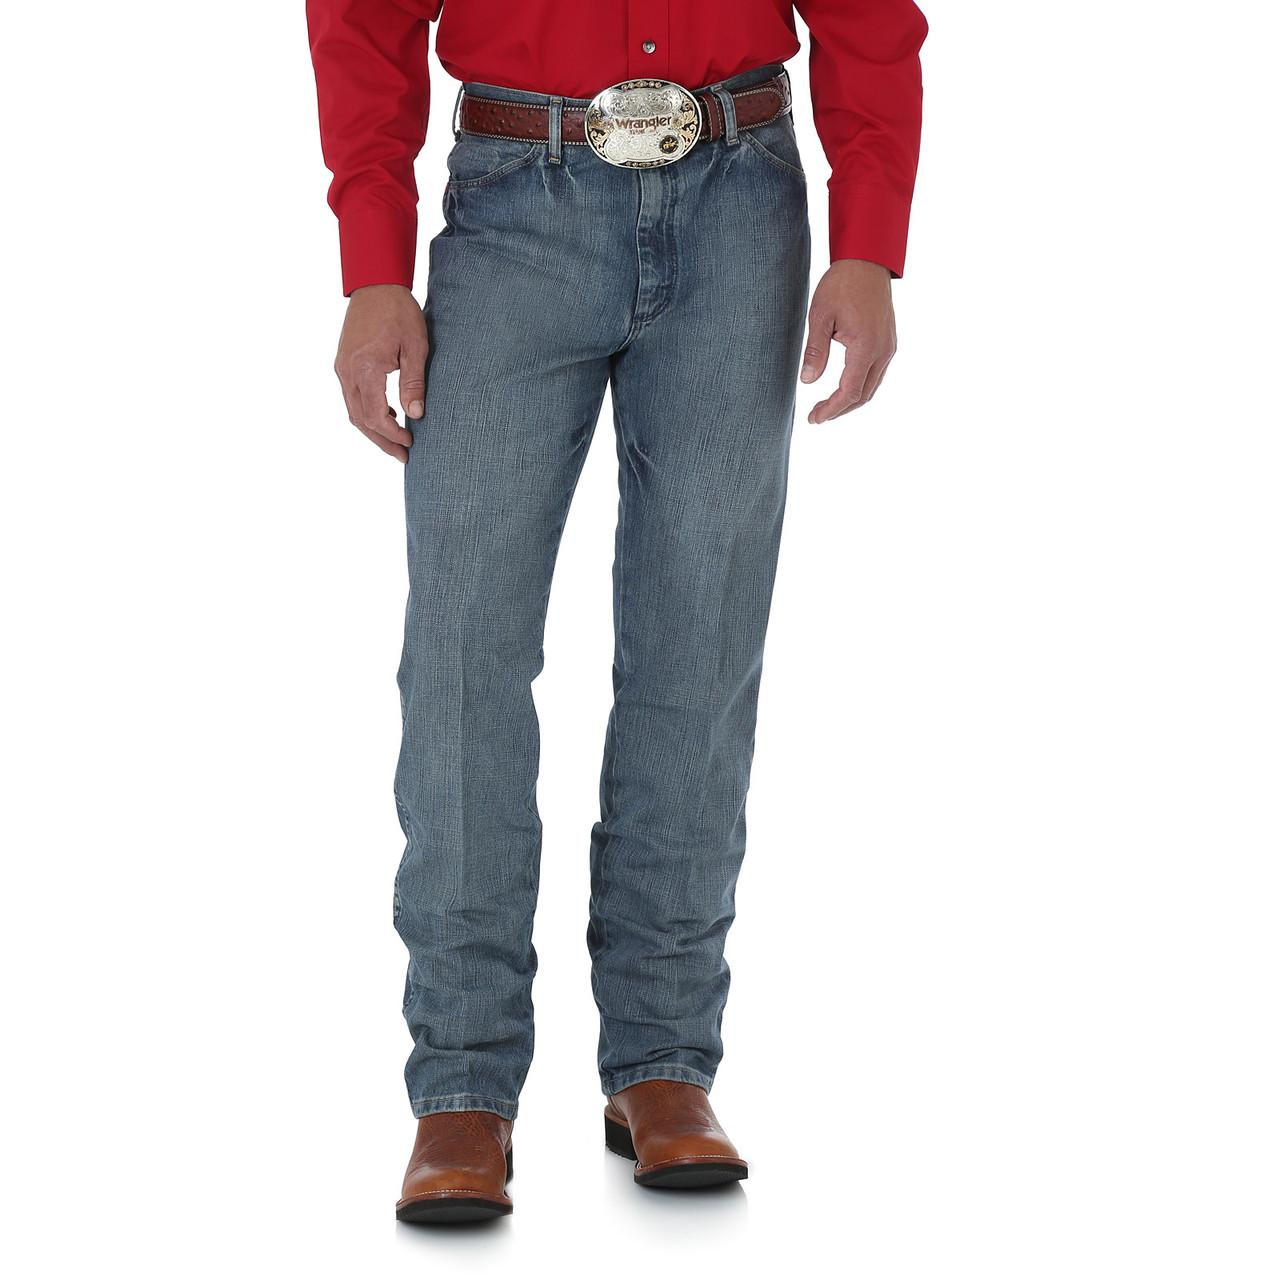 Джинсы Wrangler Cowboy Cut Slim Fit, Blue Granite, 33W34L, 0936BGM